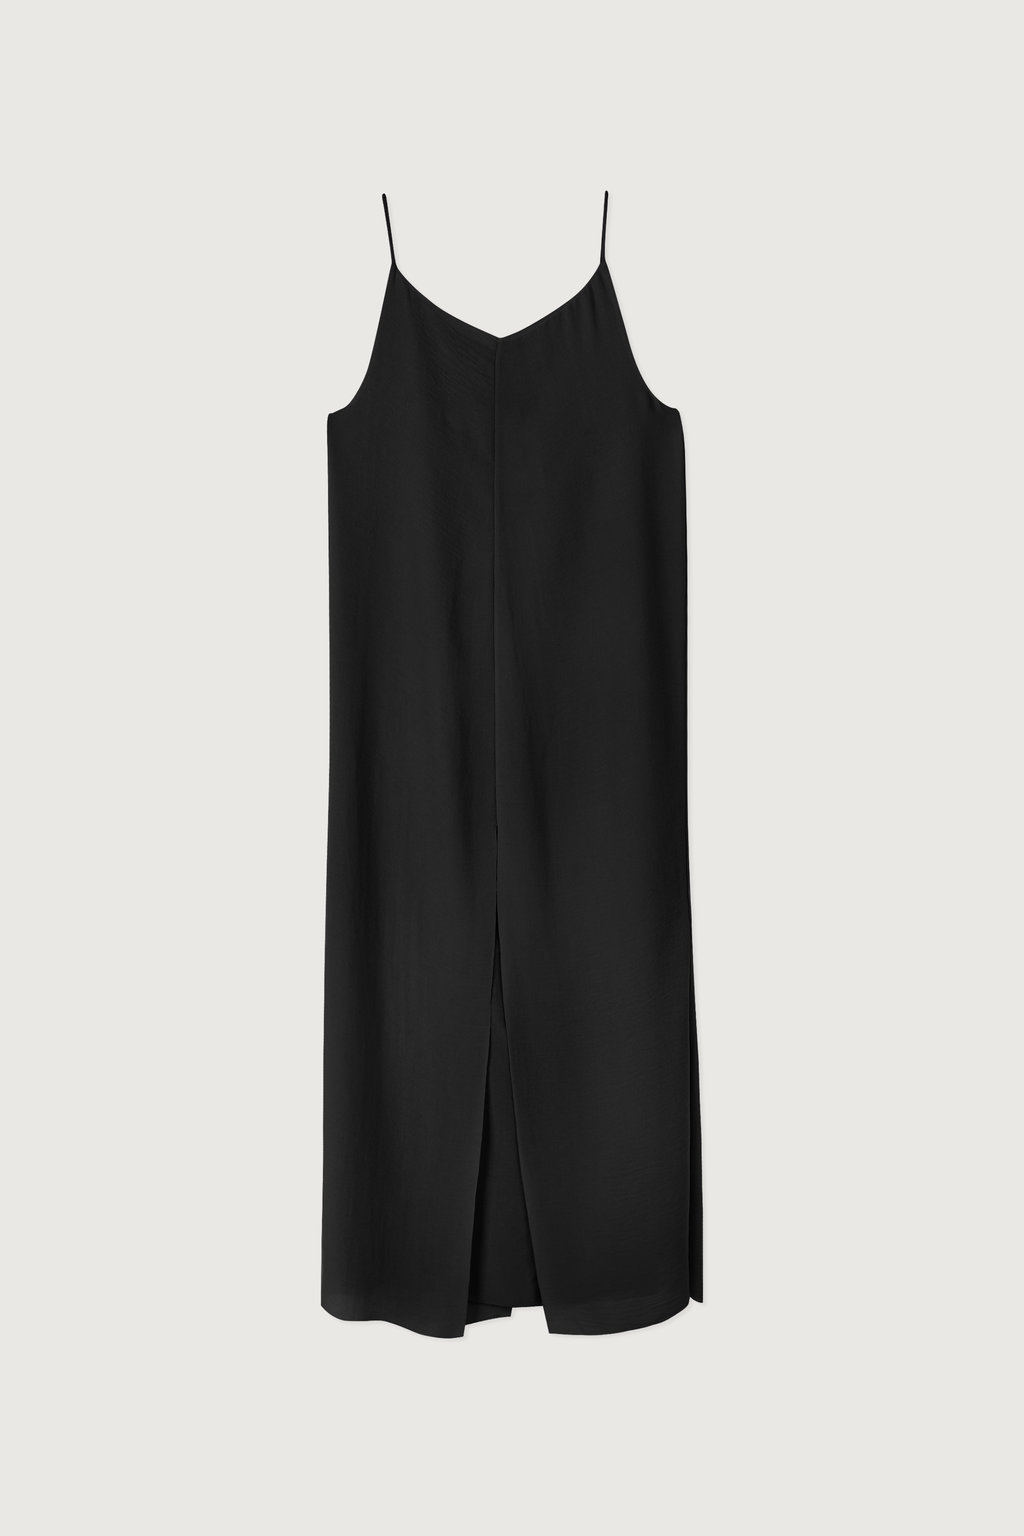 Dress 3243 Black 7